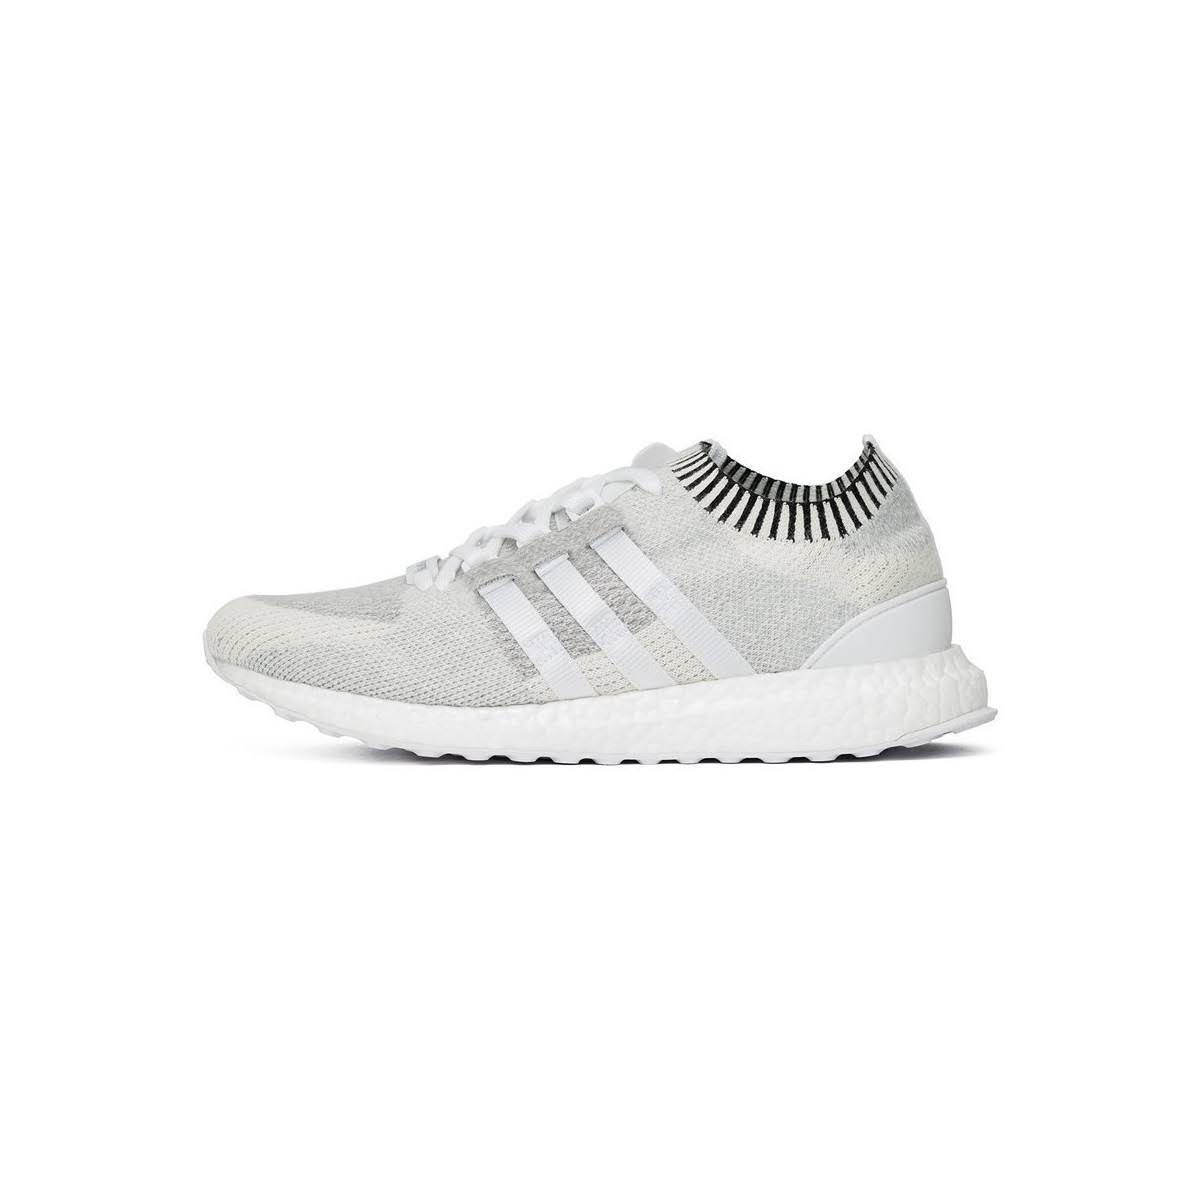 adidas Eqt Support Ultra Primeknit Shoes (Trainers) (men)